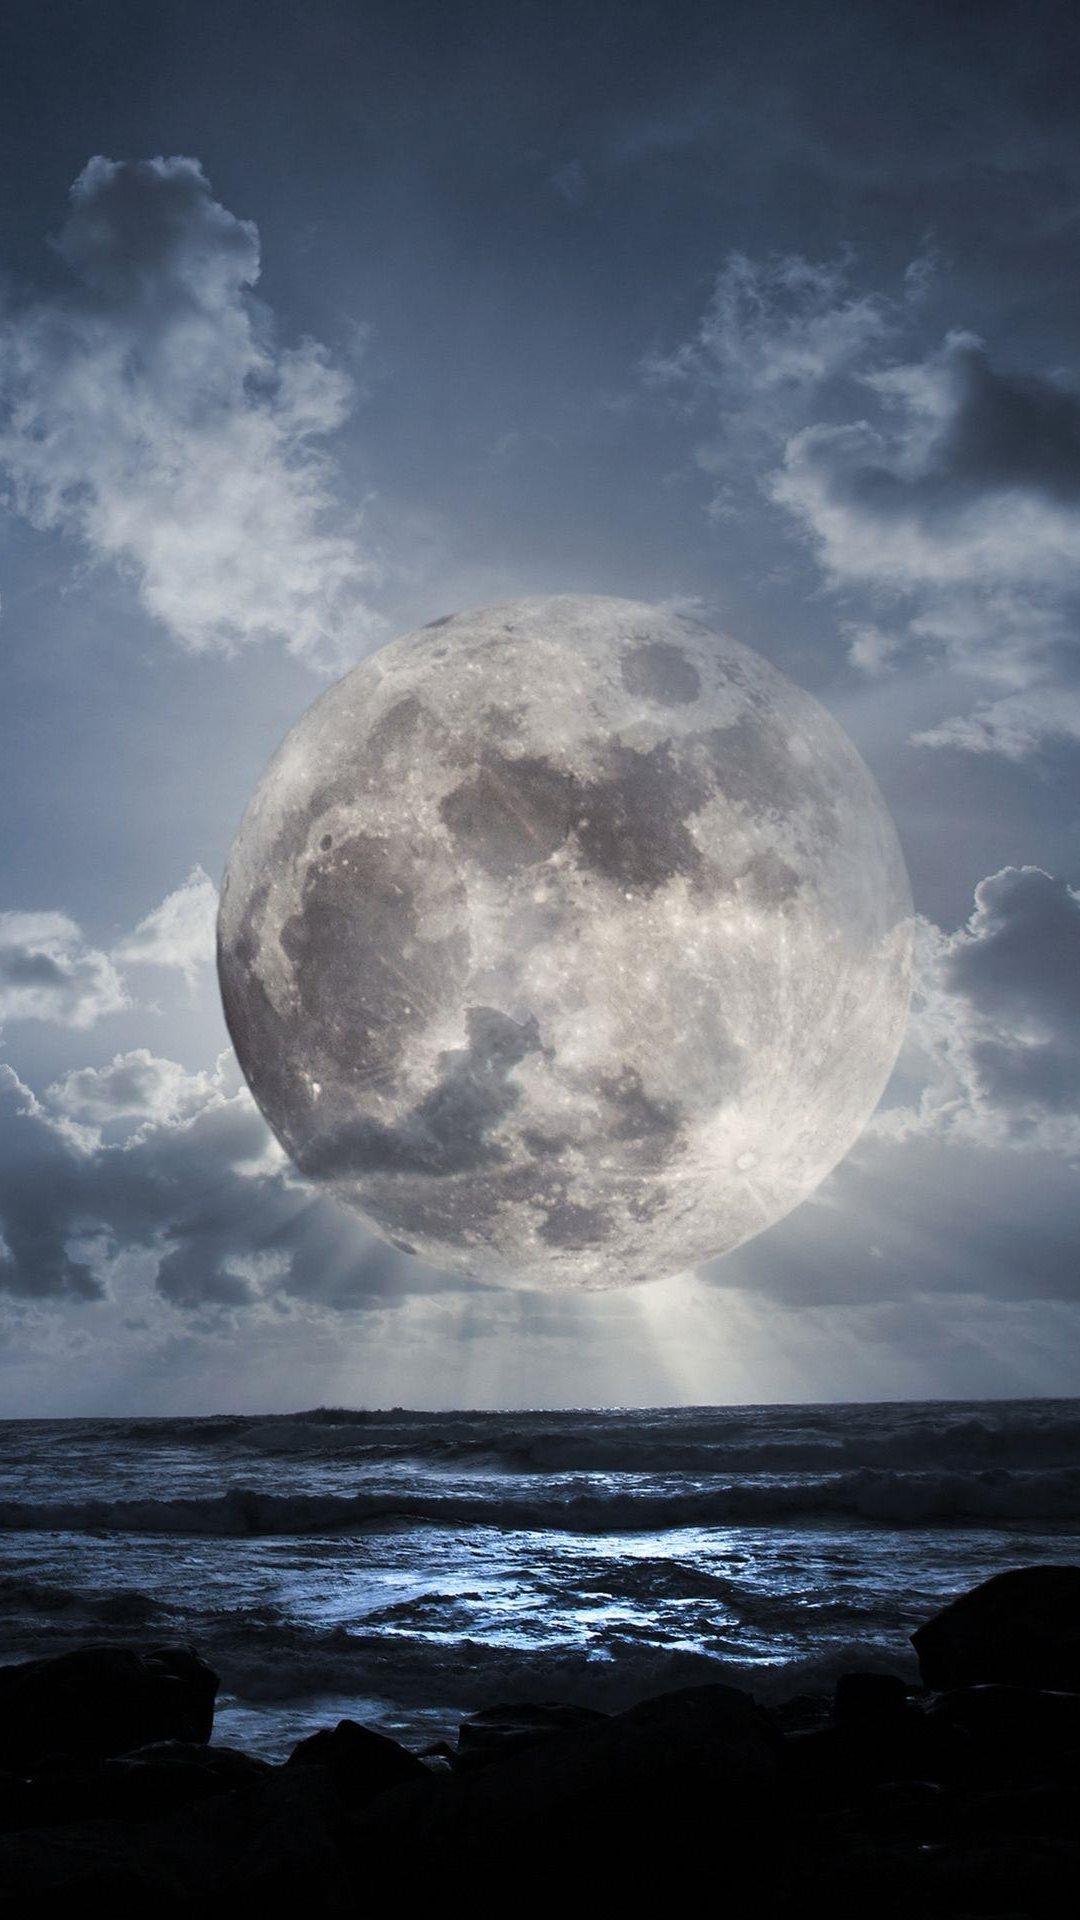 Super Moon Over Sea iPhone 6 Wallpaper Download iPhone Wallpapers 1080x1920